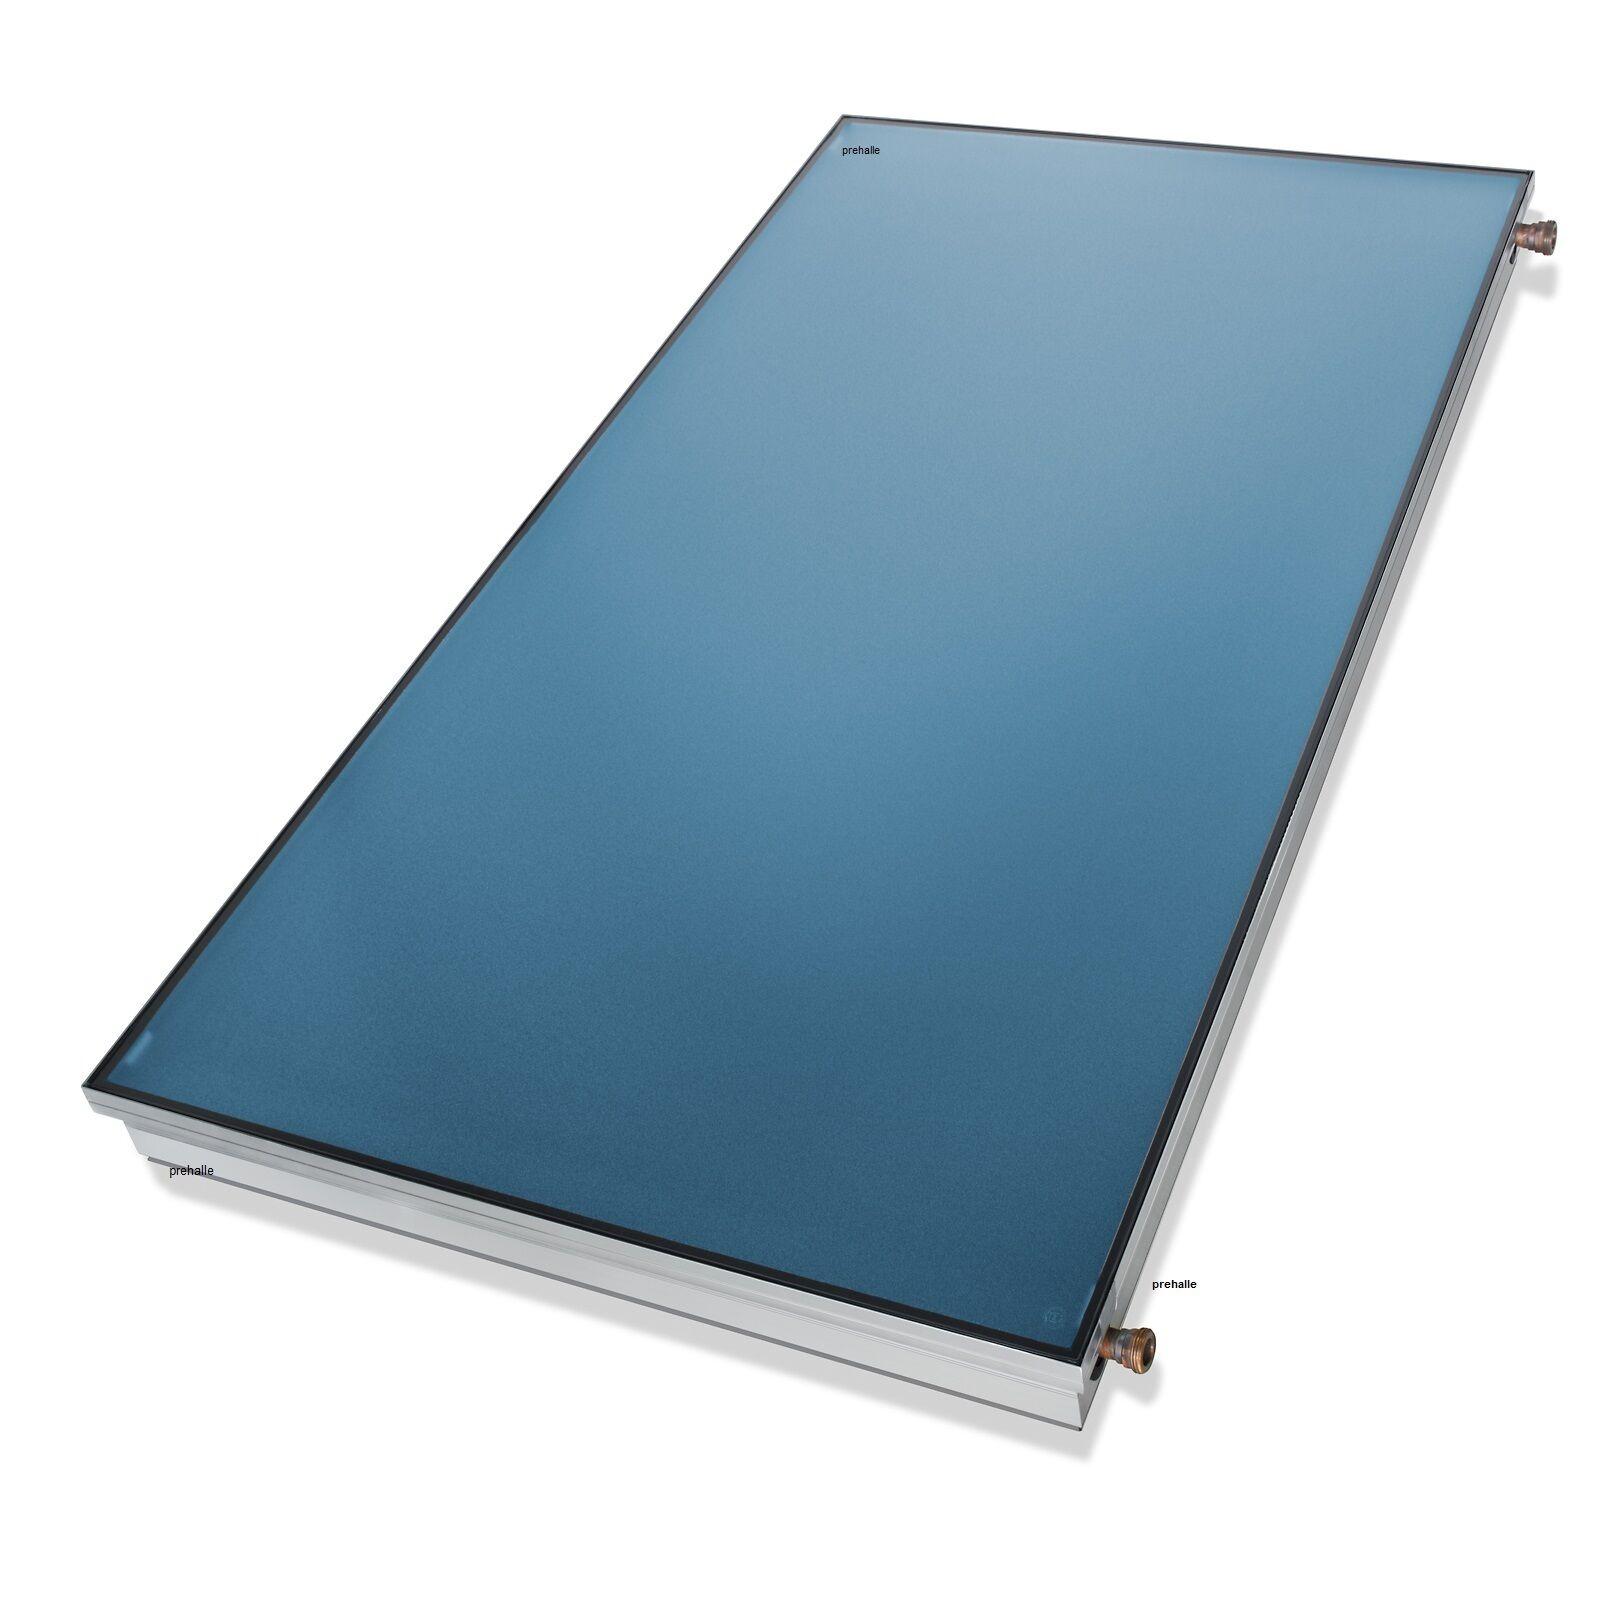 1A PRE 4,68m² Flachkollektor Solaranlage + Wärmepumpenspeicher 300L 1 WT. Spa